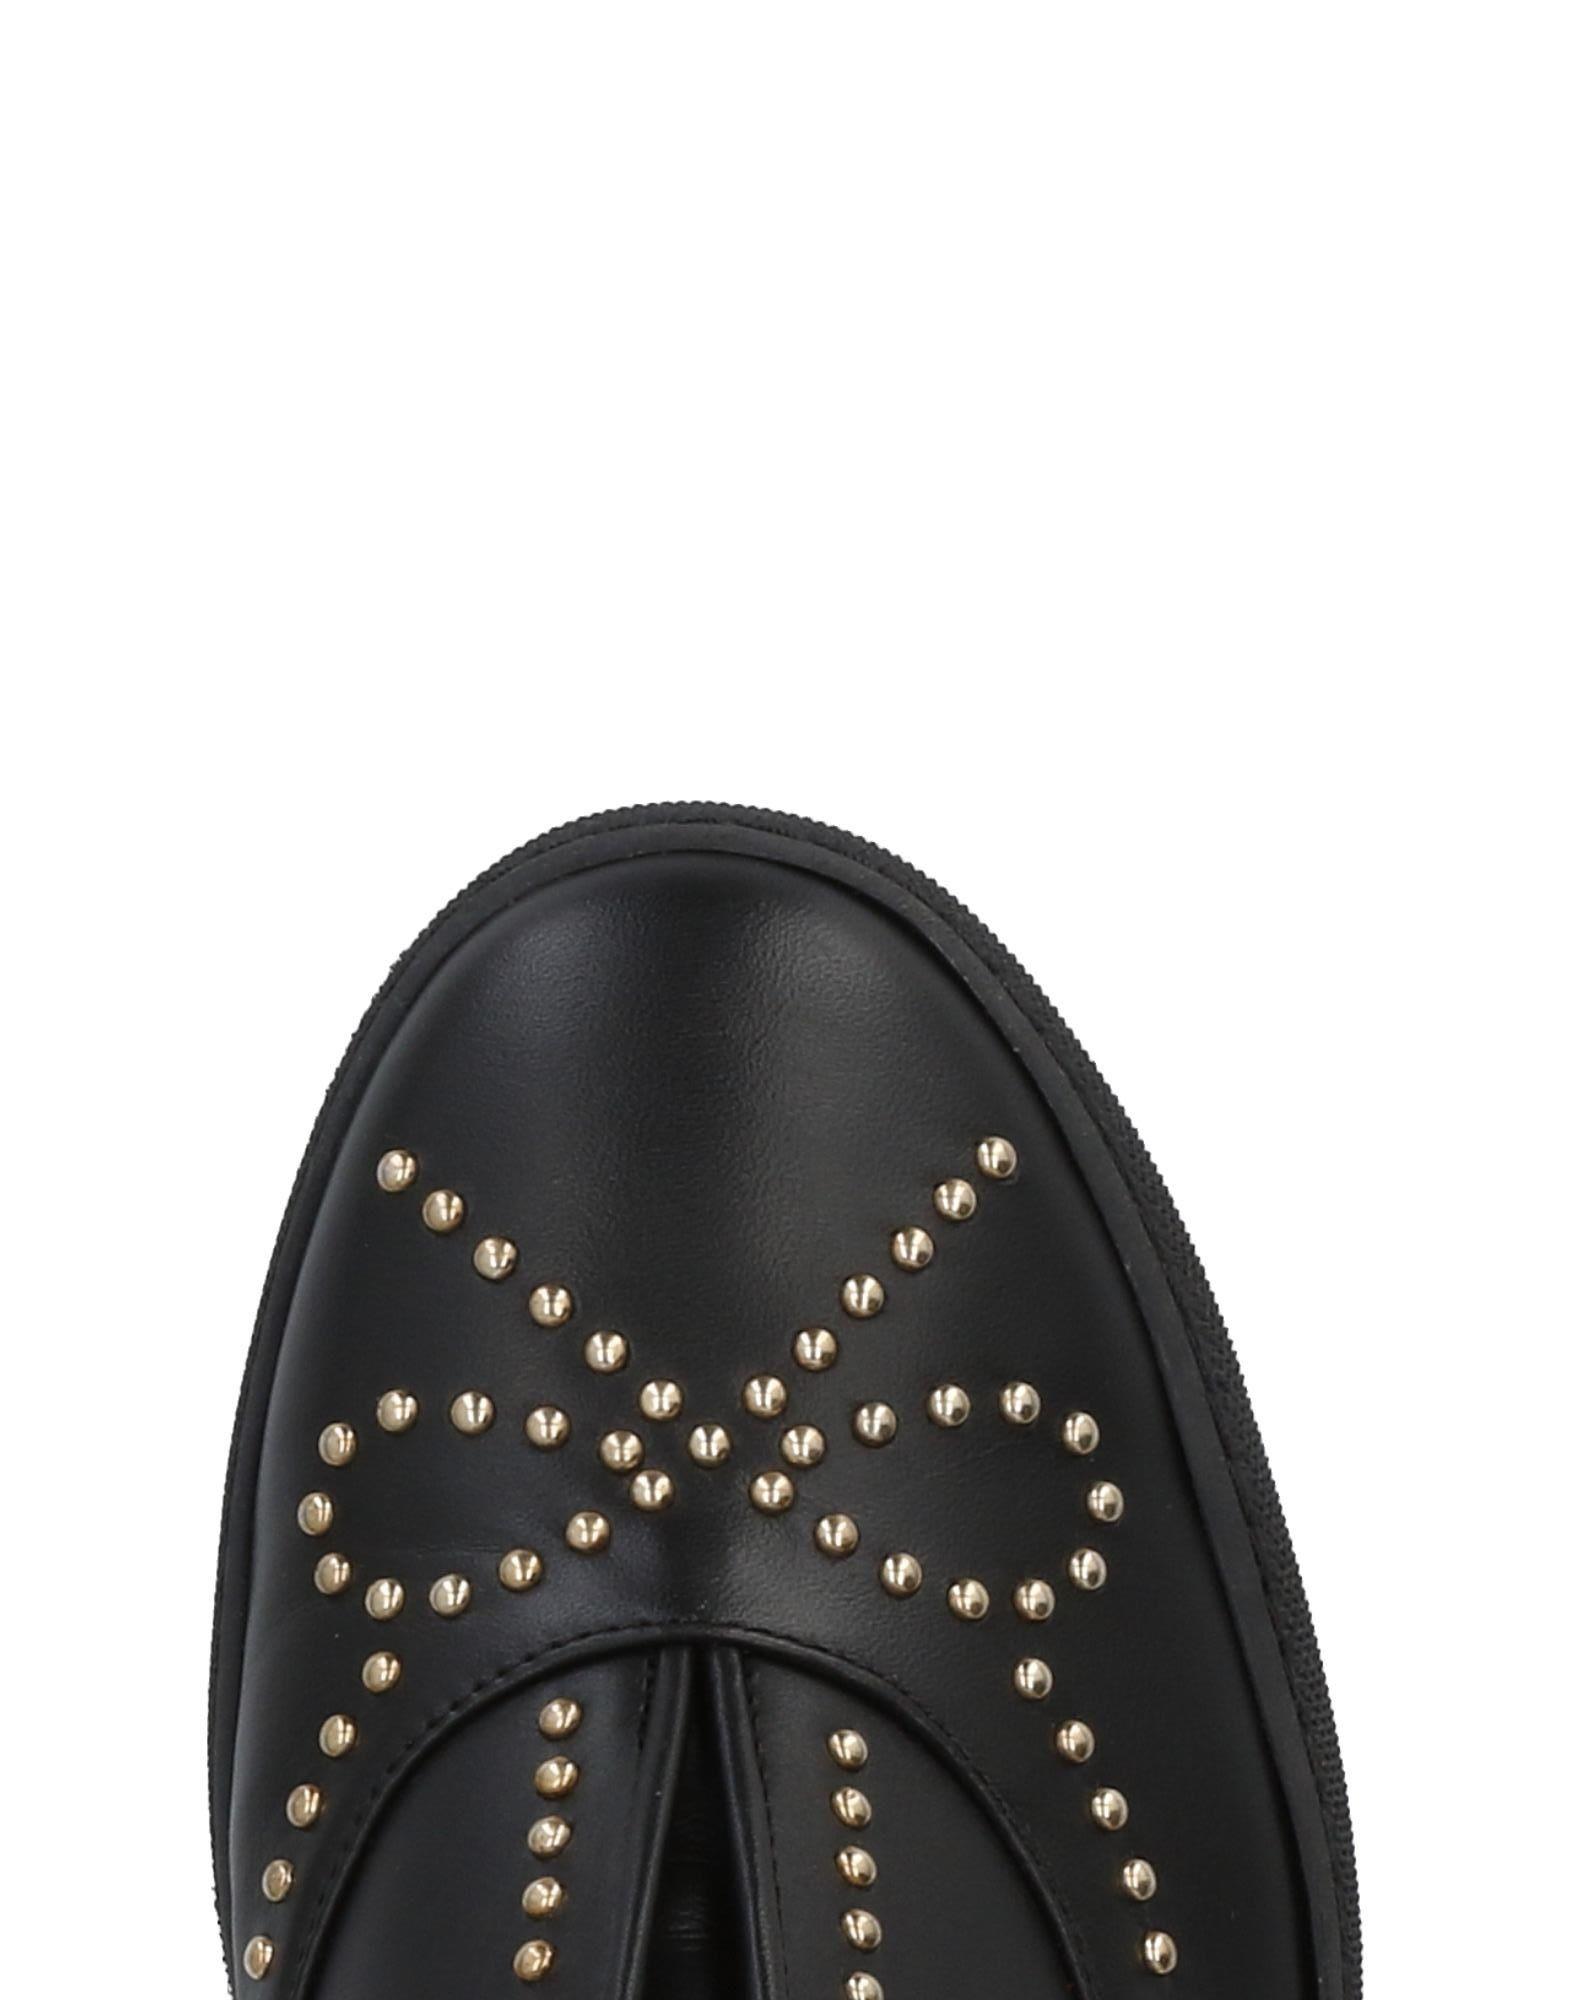 Stilvolle Moschino billige Schuhe Boutique Moschino Stilvolle Sneakers Damen  11447313WL 20332e